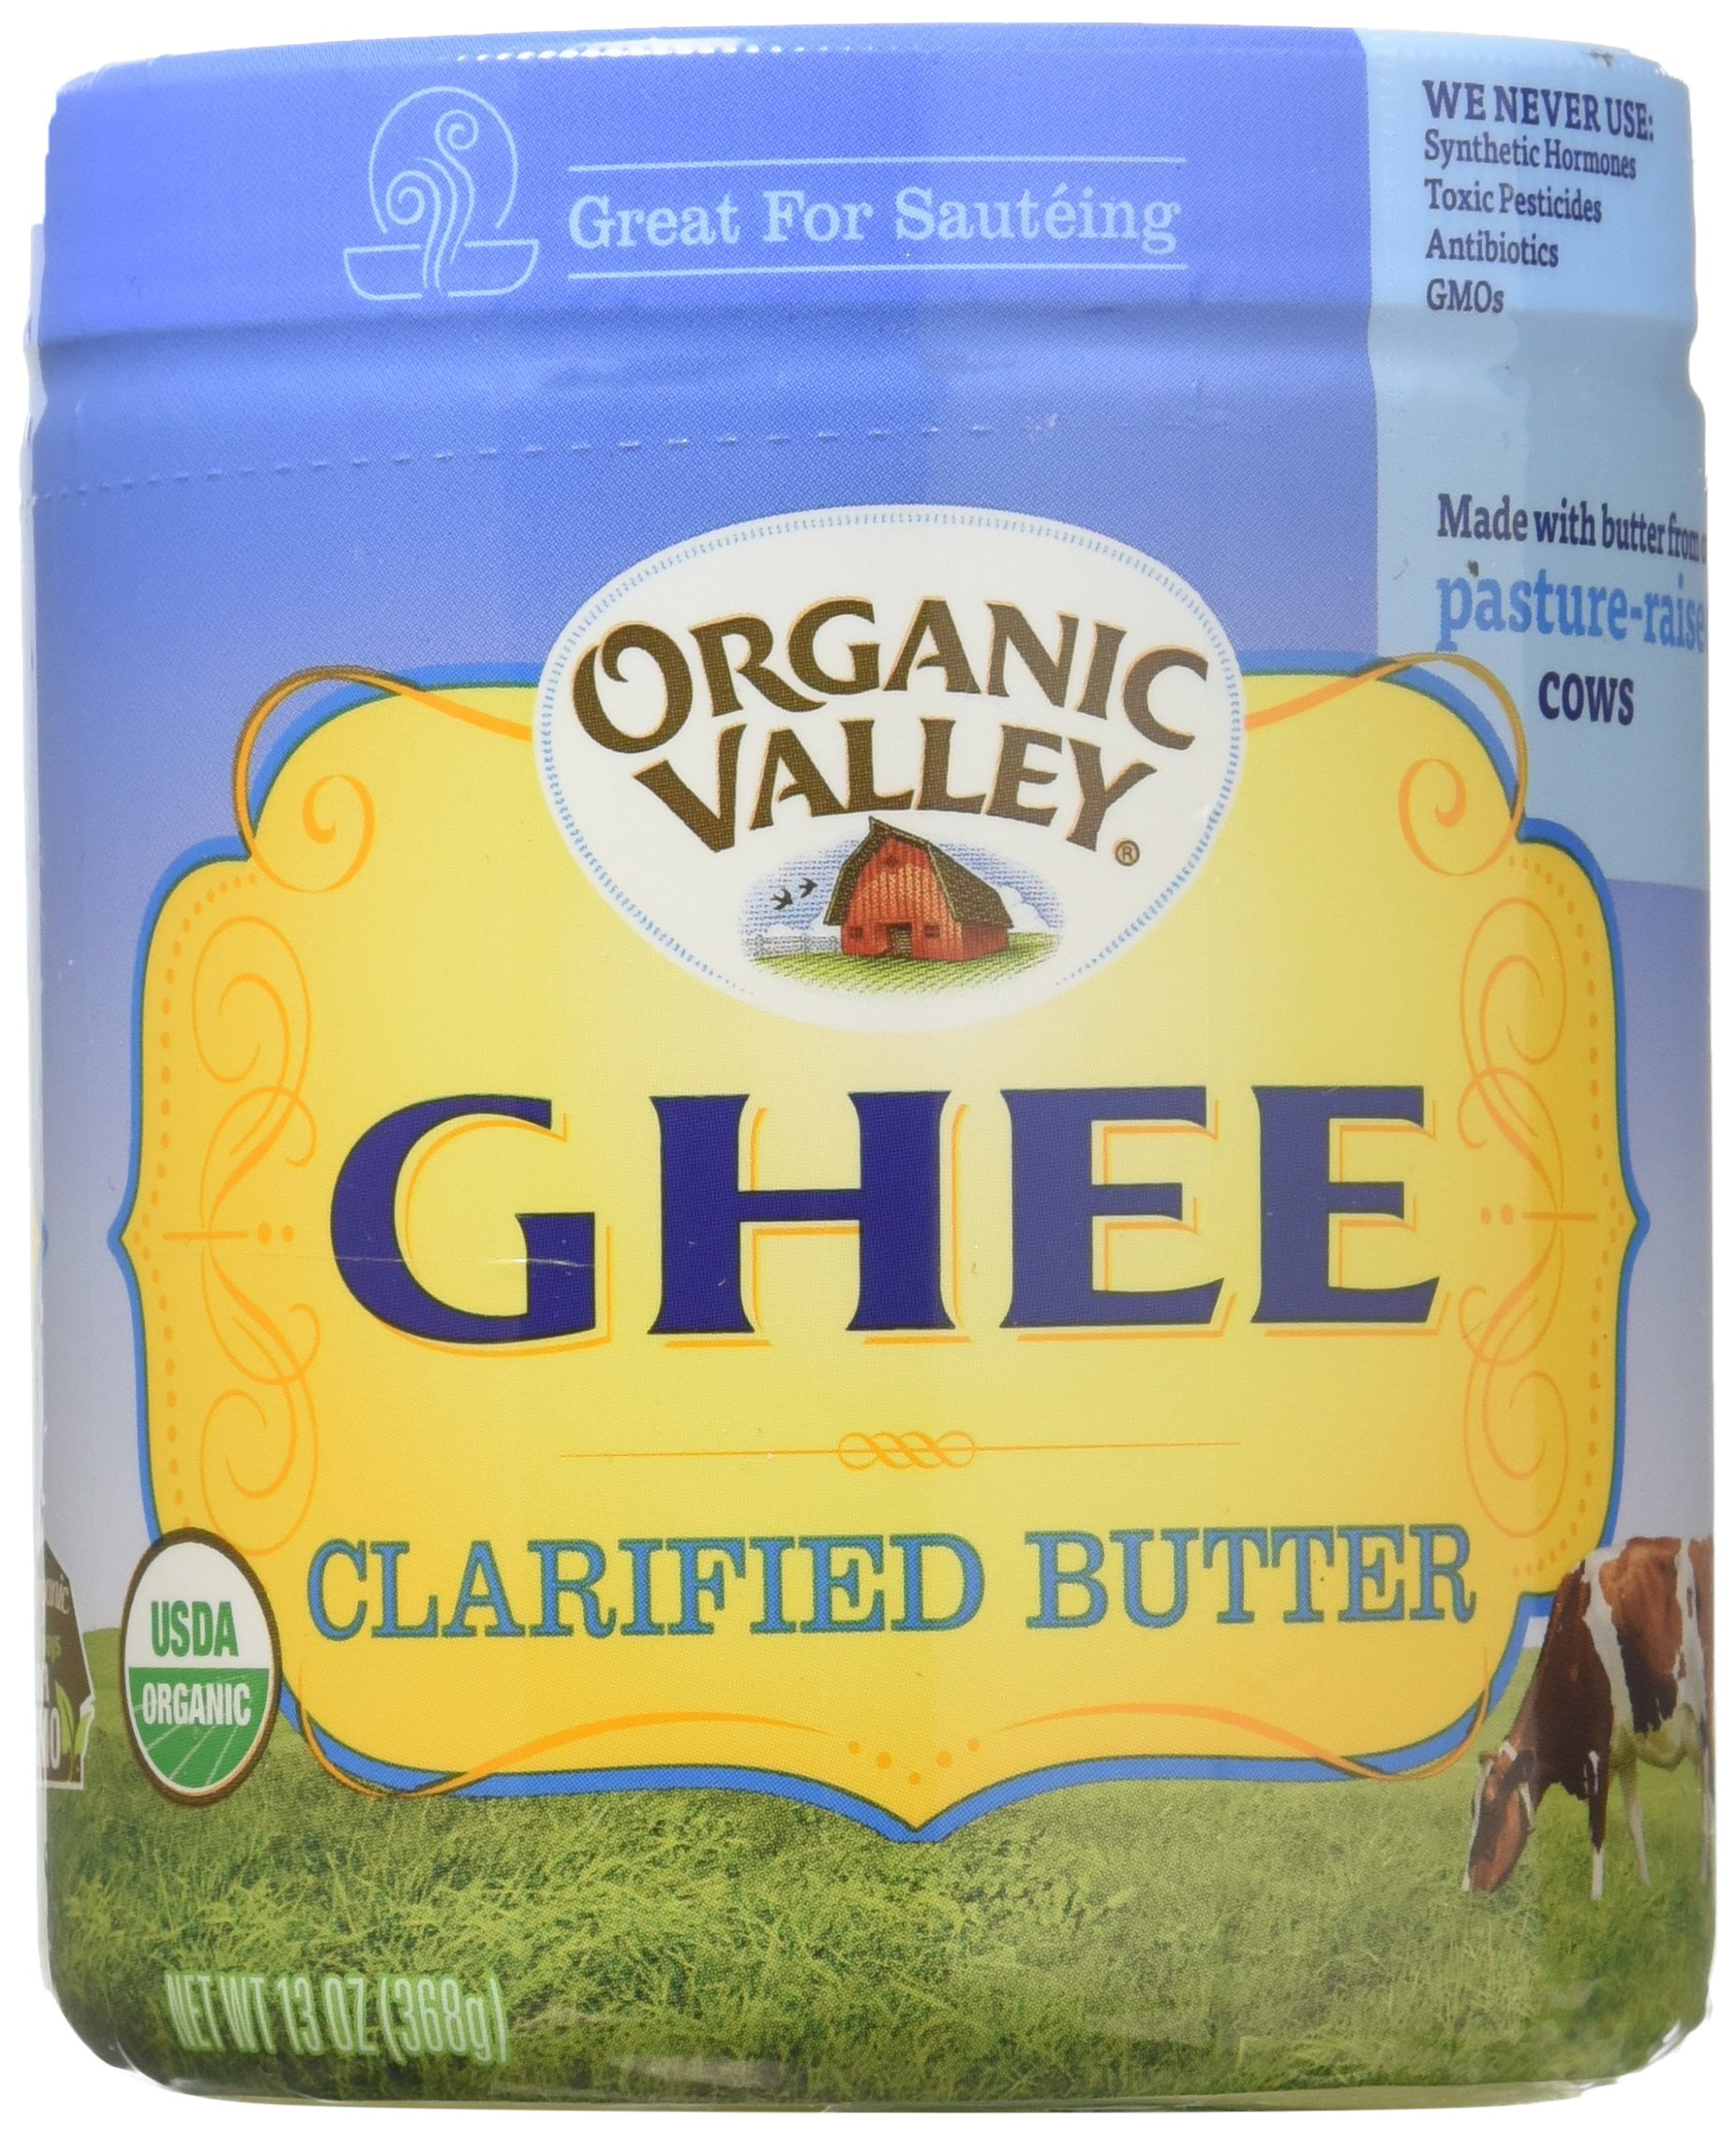 Ghee, 95% organic, Clarified Butter, 13 oz pack of 4